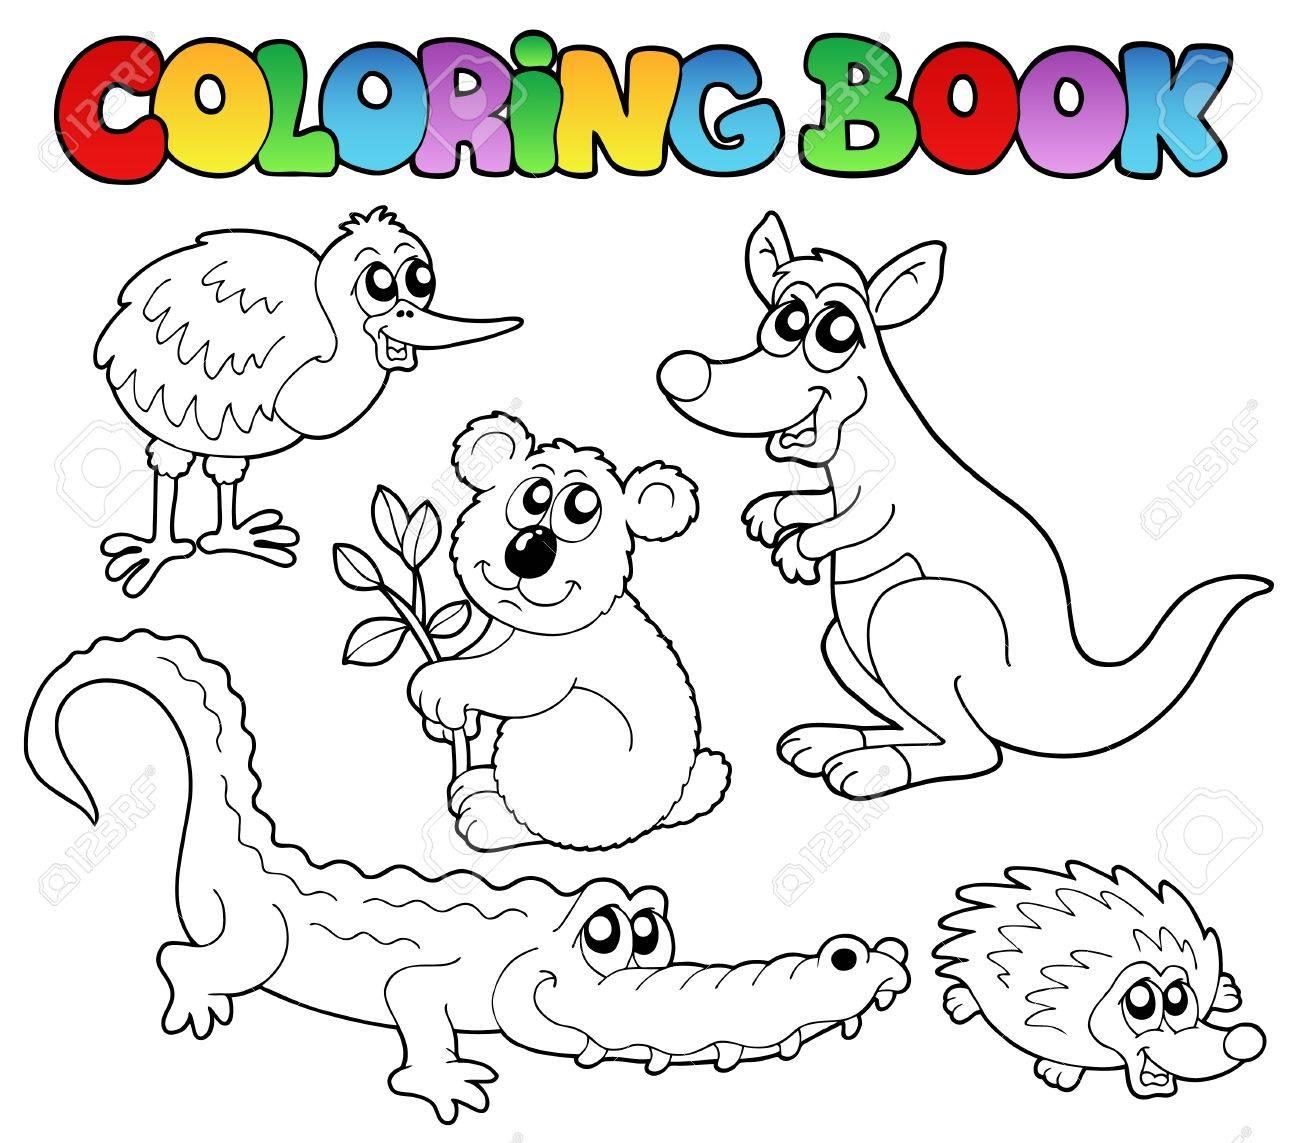 coloring book australian animals 1 vector illustration royalty